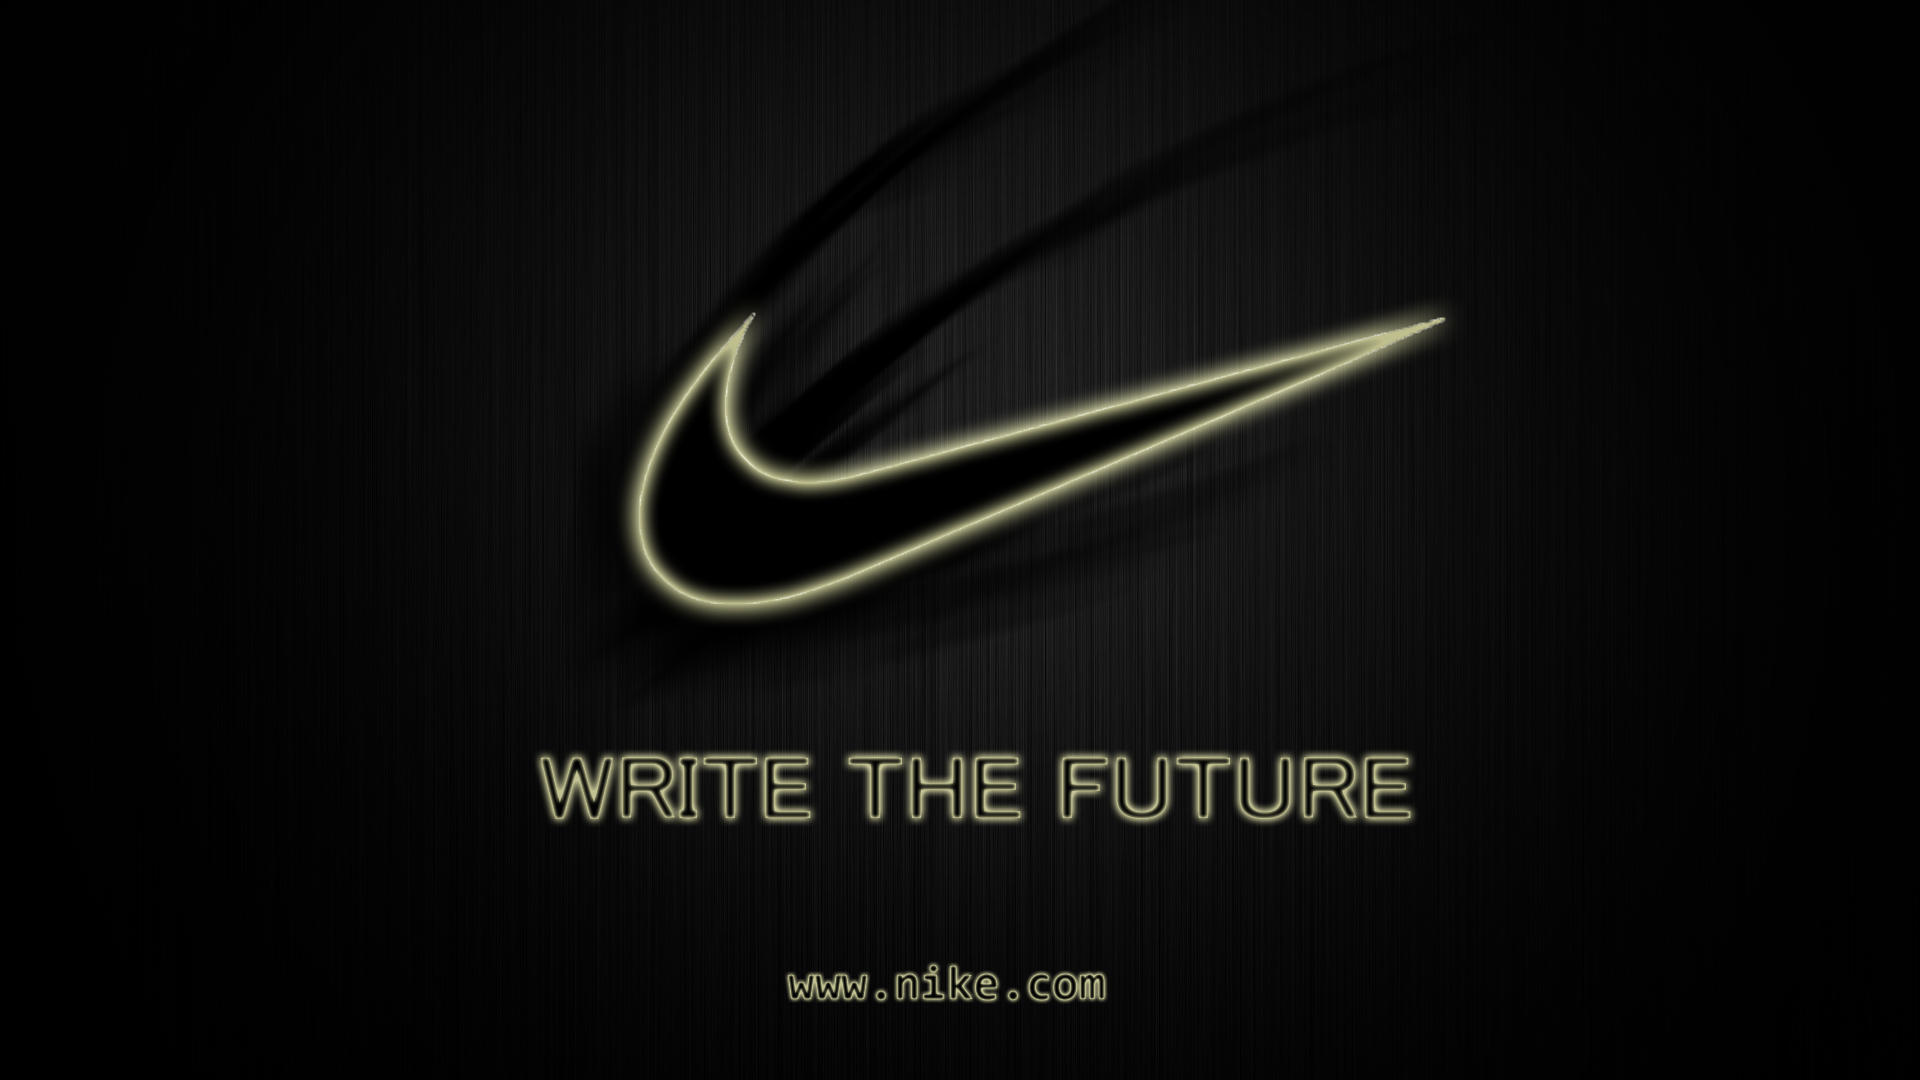 online retailer dad31 59e25 Nike by sHoCkWaV325 Nike by sHoCkWaV325  Nike Write the Future ...